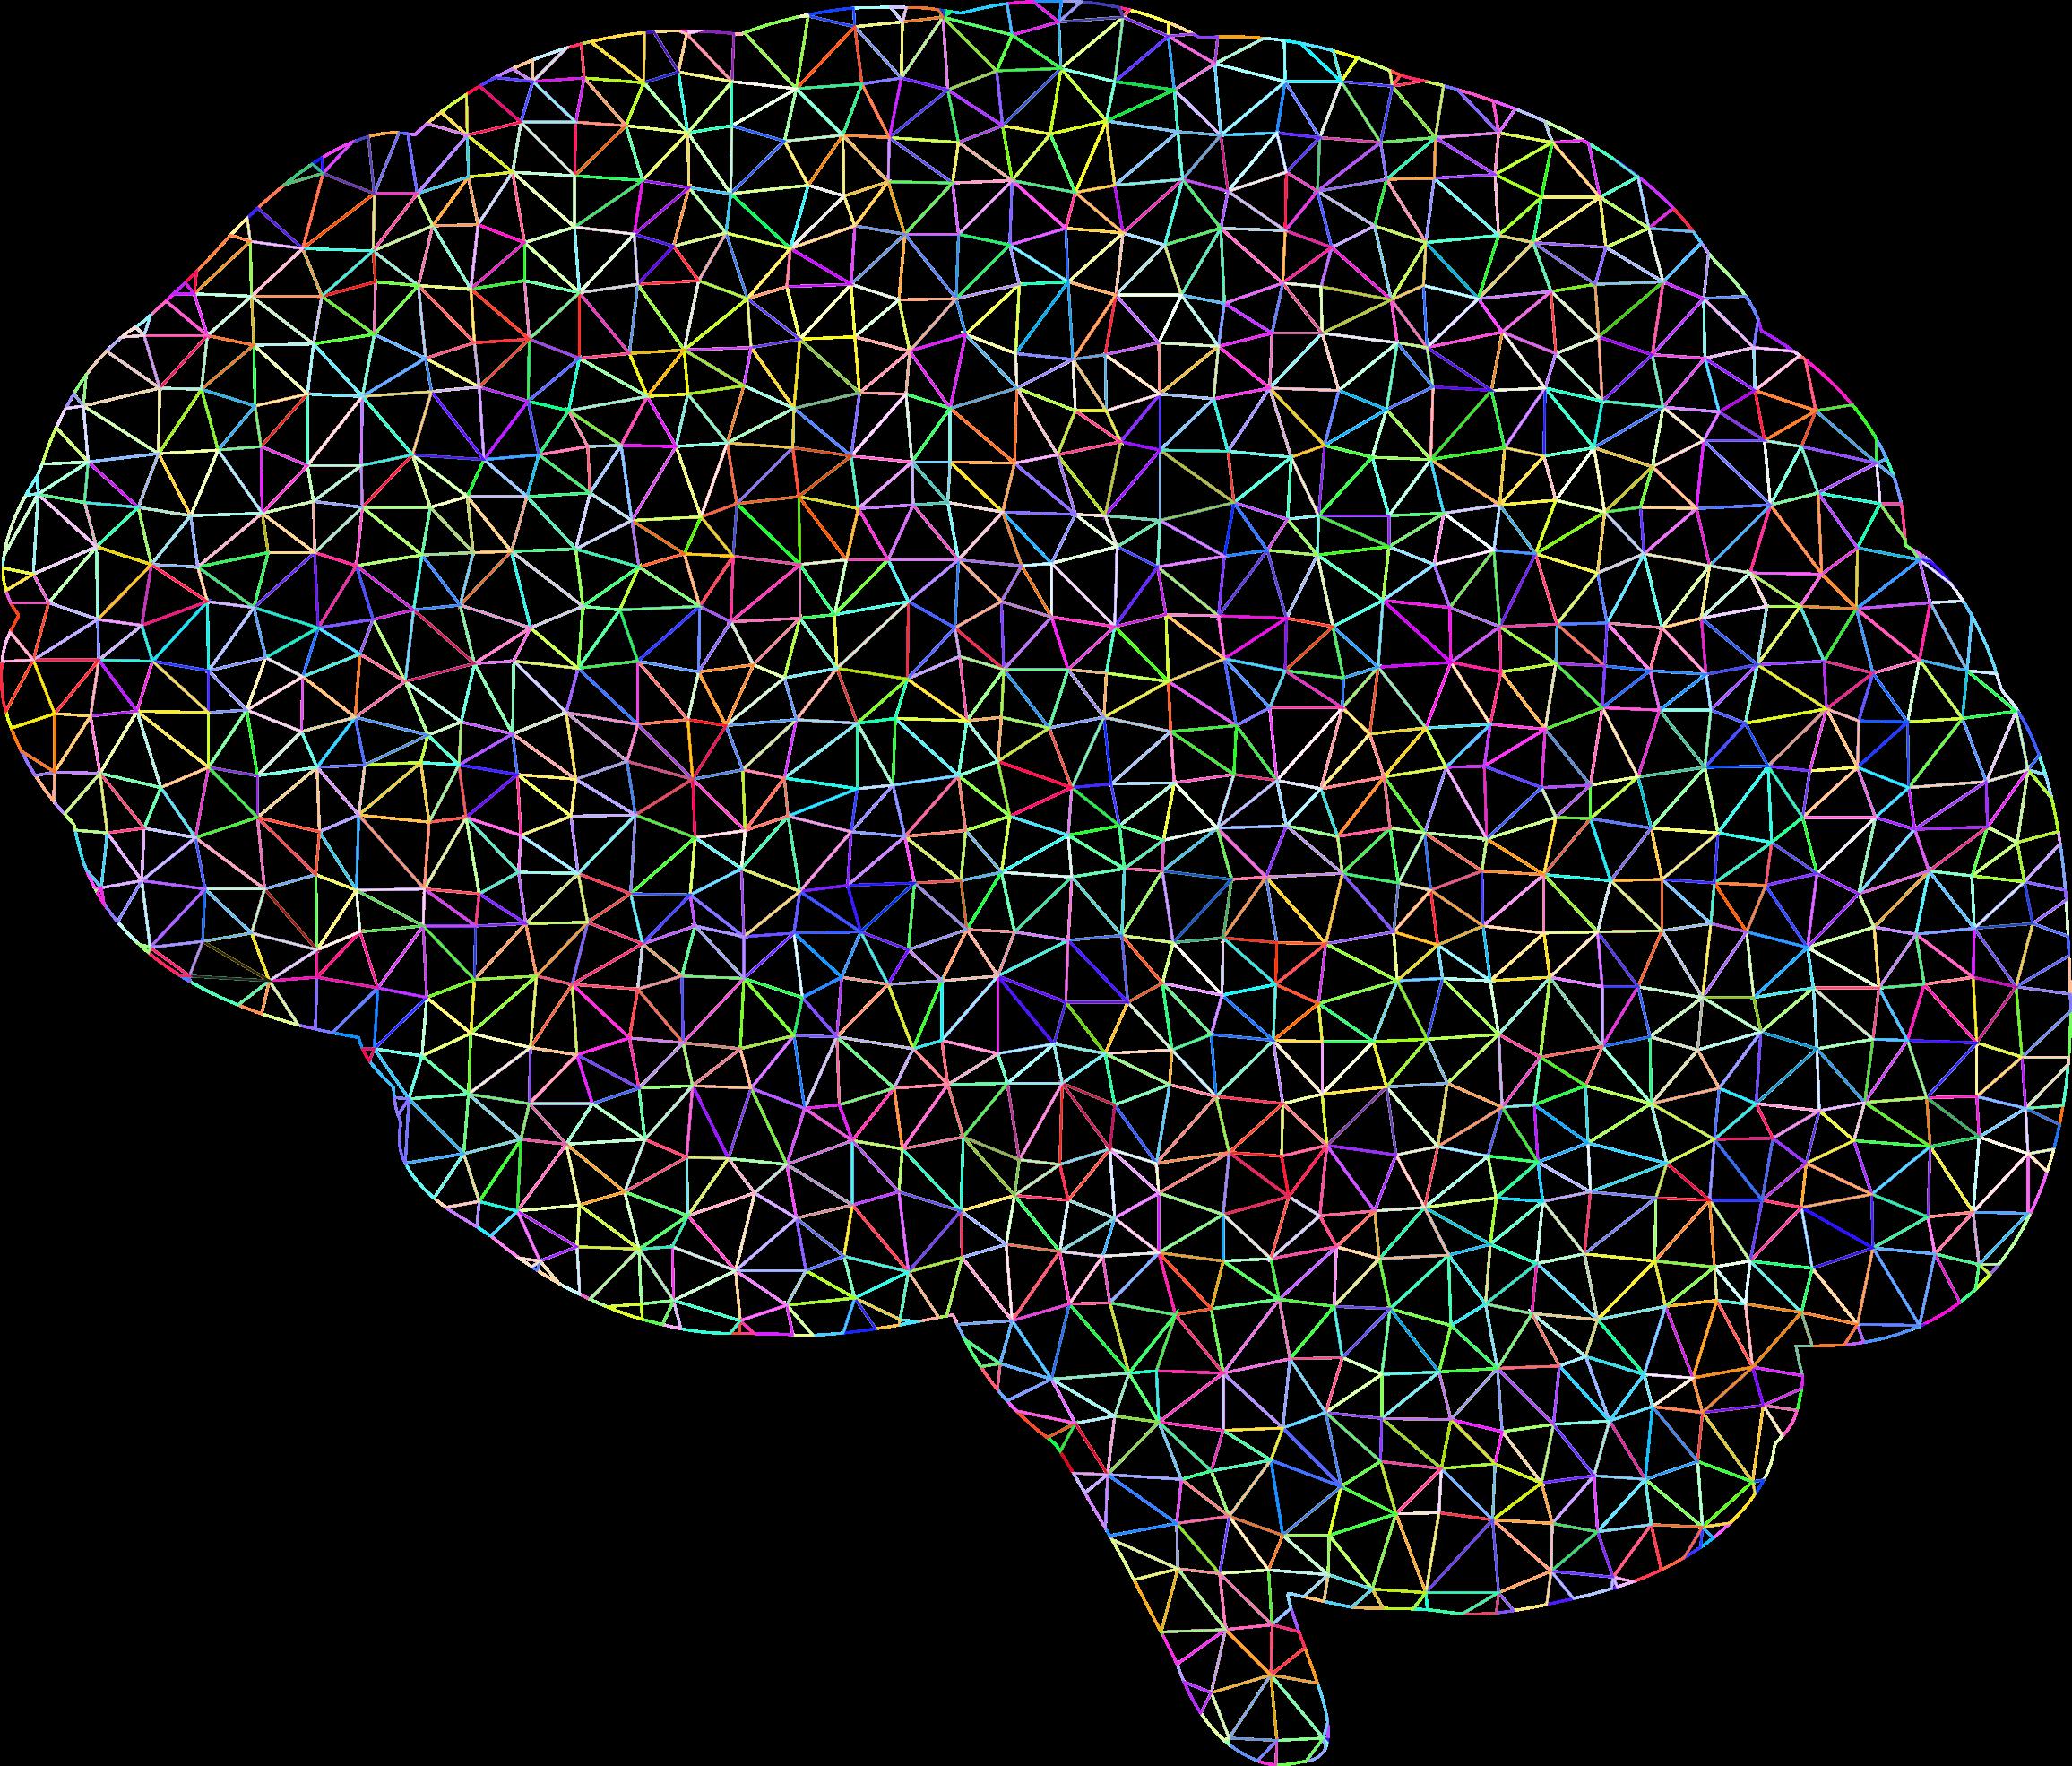 Clipart brain transparent background, Clipart brain ...